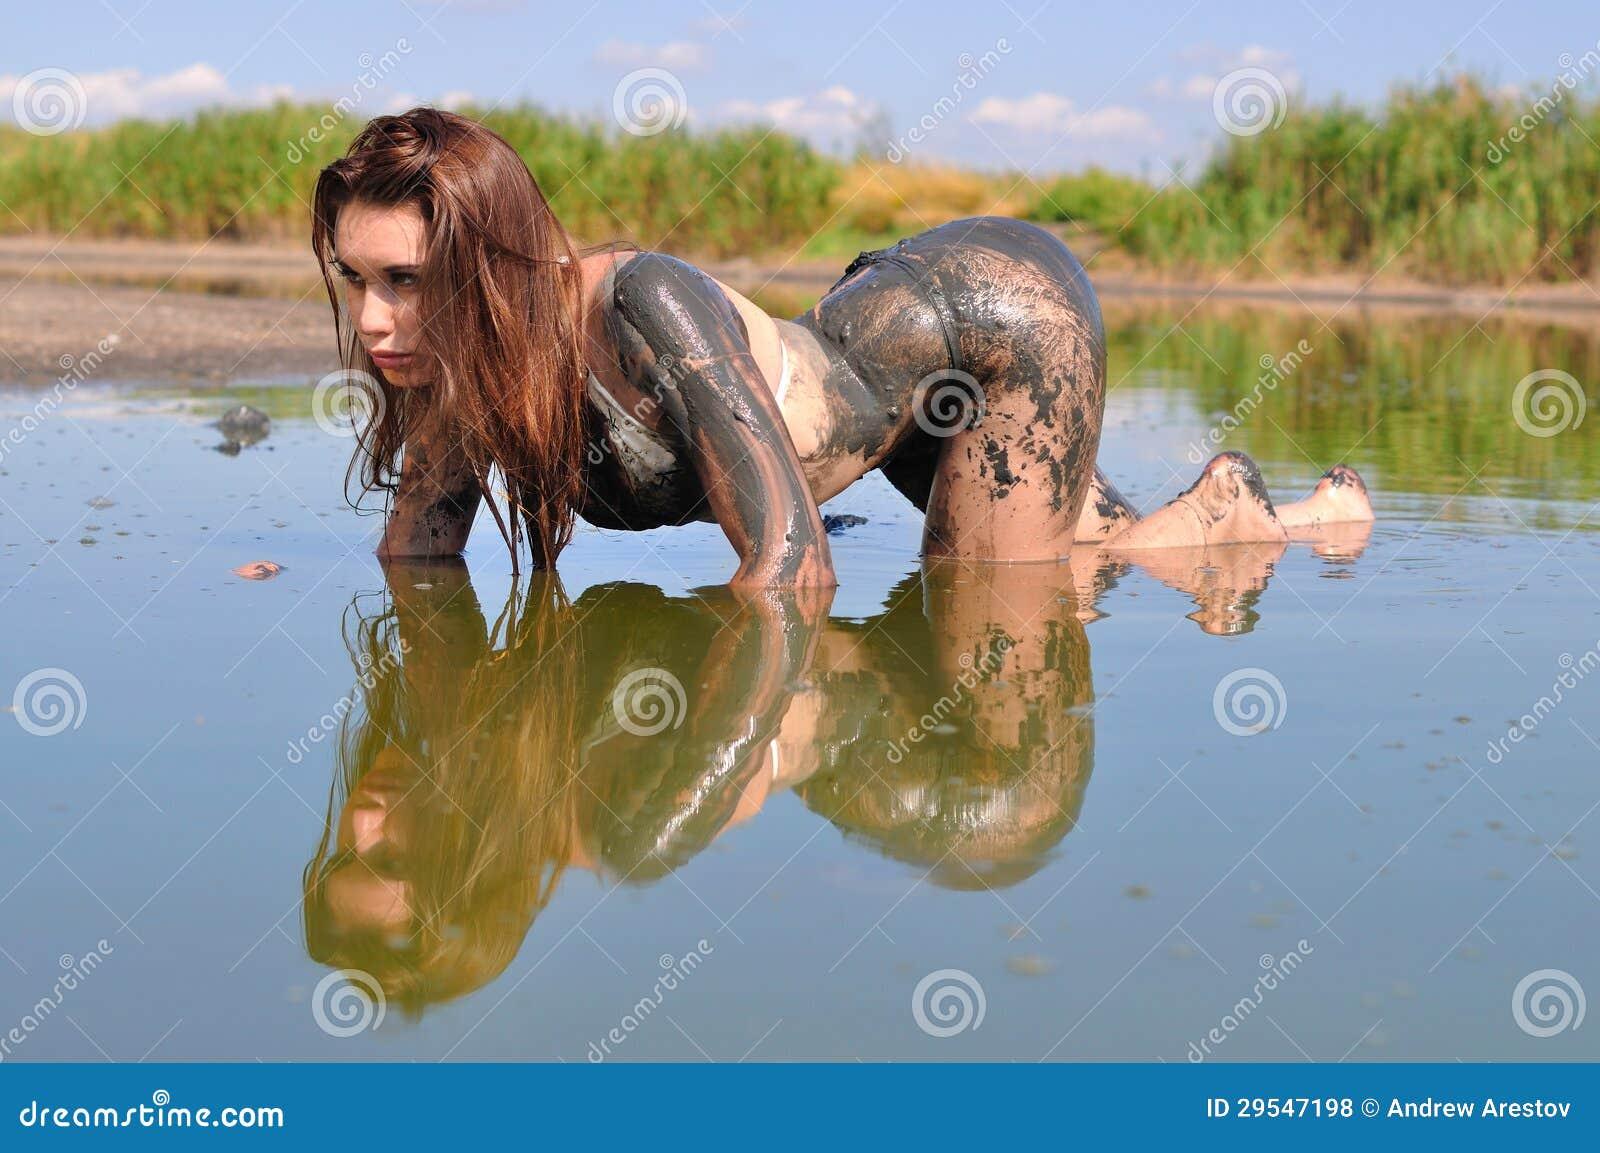 Русский секс в грязи, В грязи - бесплатное онлайн порно на сайте TopPorno 21 фотография